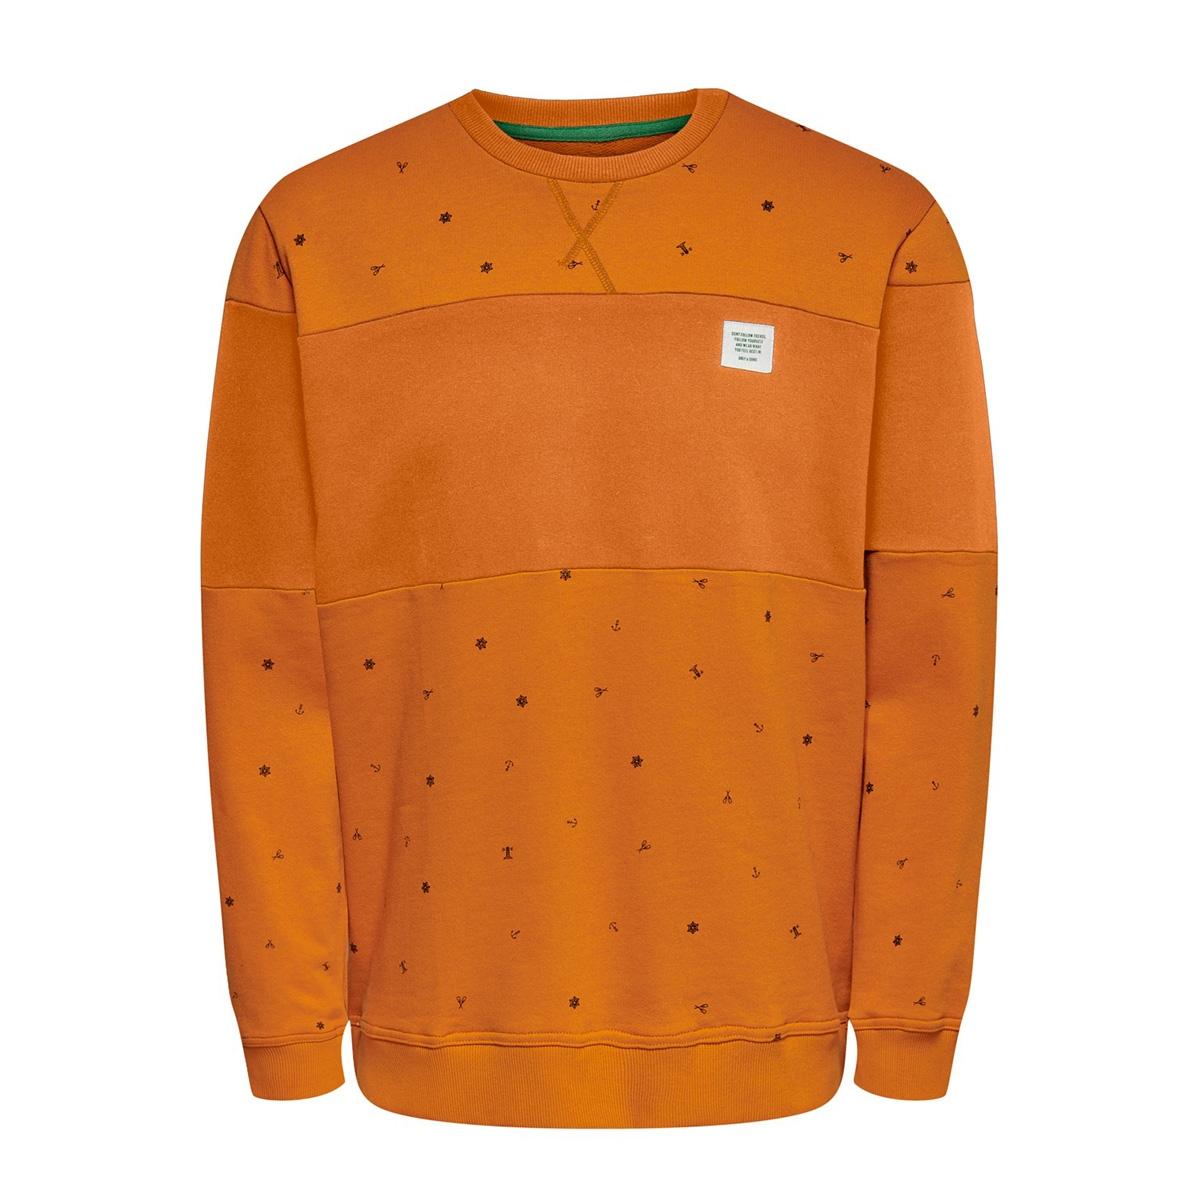 onsdexter reg crew neck sweat 22015400 only & sons sweater marmalade